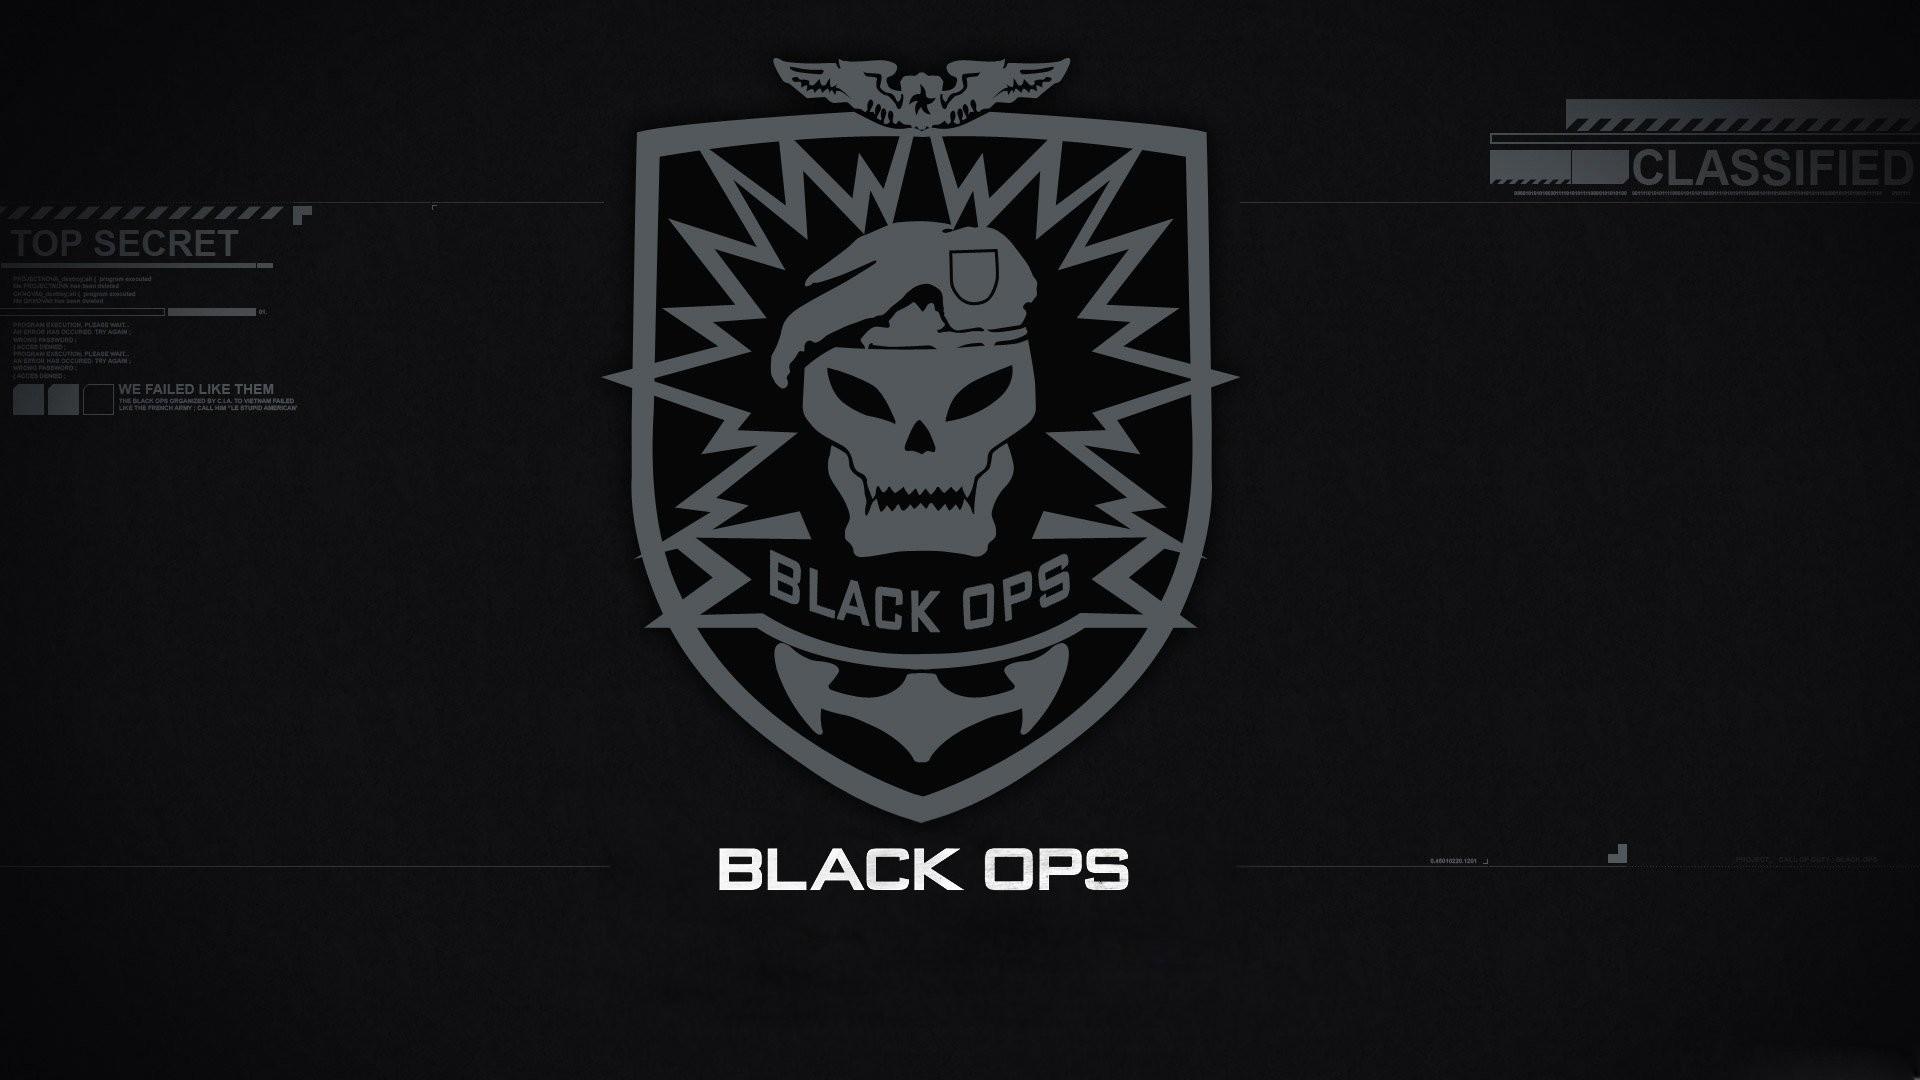 Black Ops Wallpaper Wallpaper